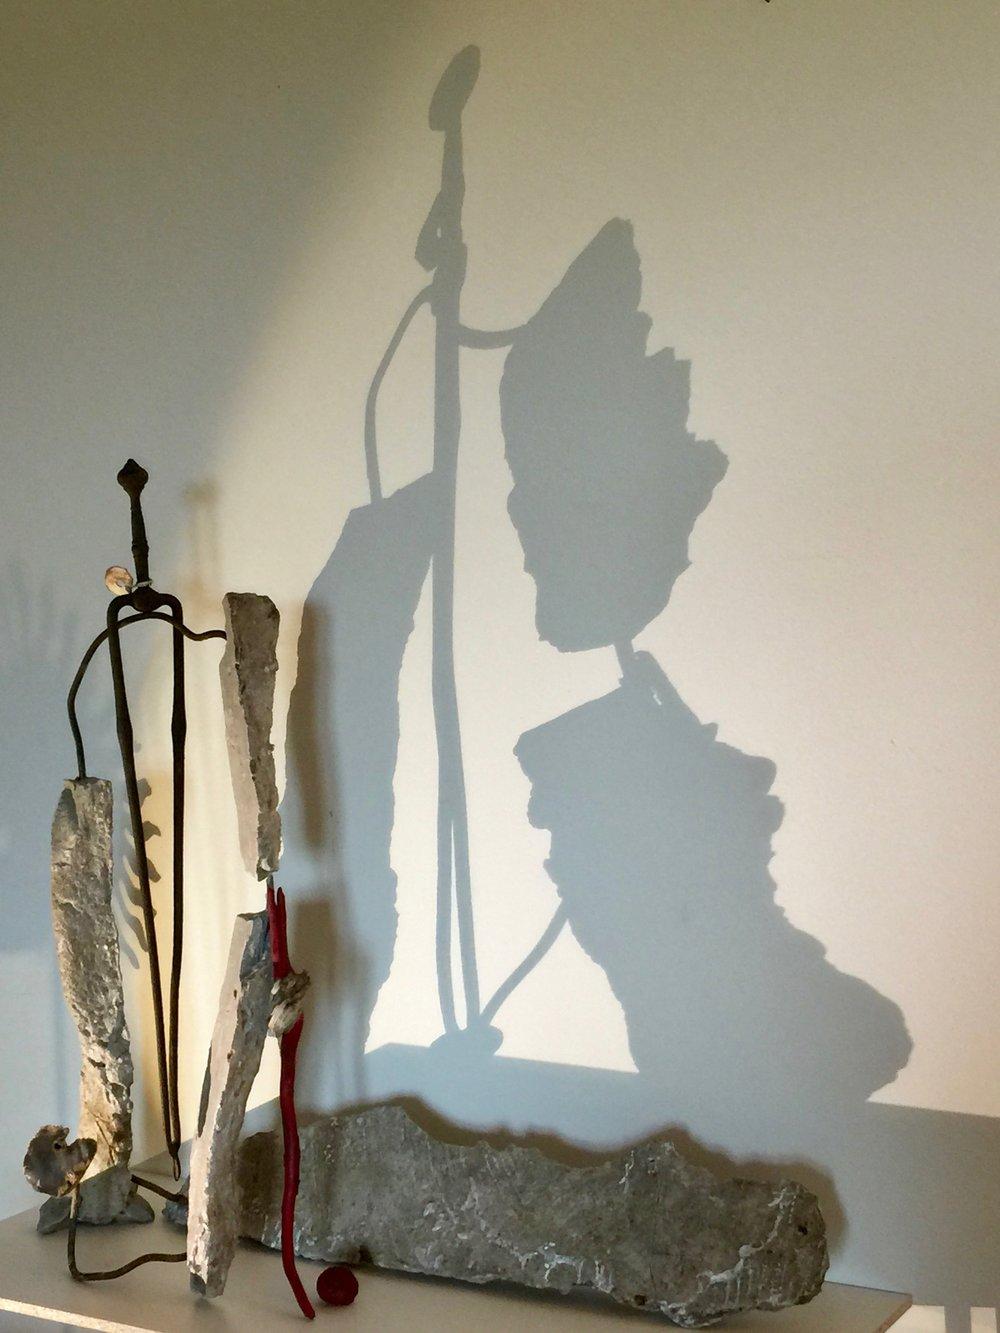 Betonskulptur mit Schatten (2017)